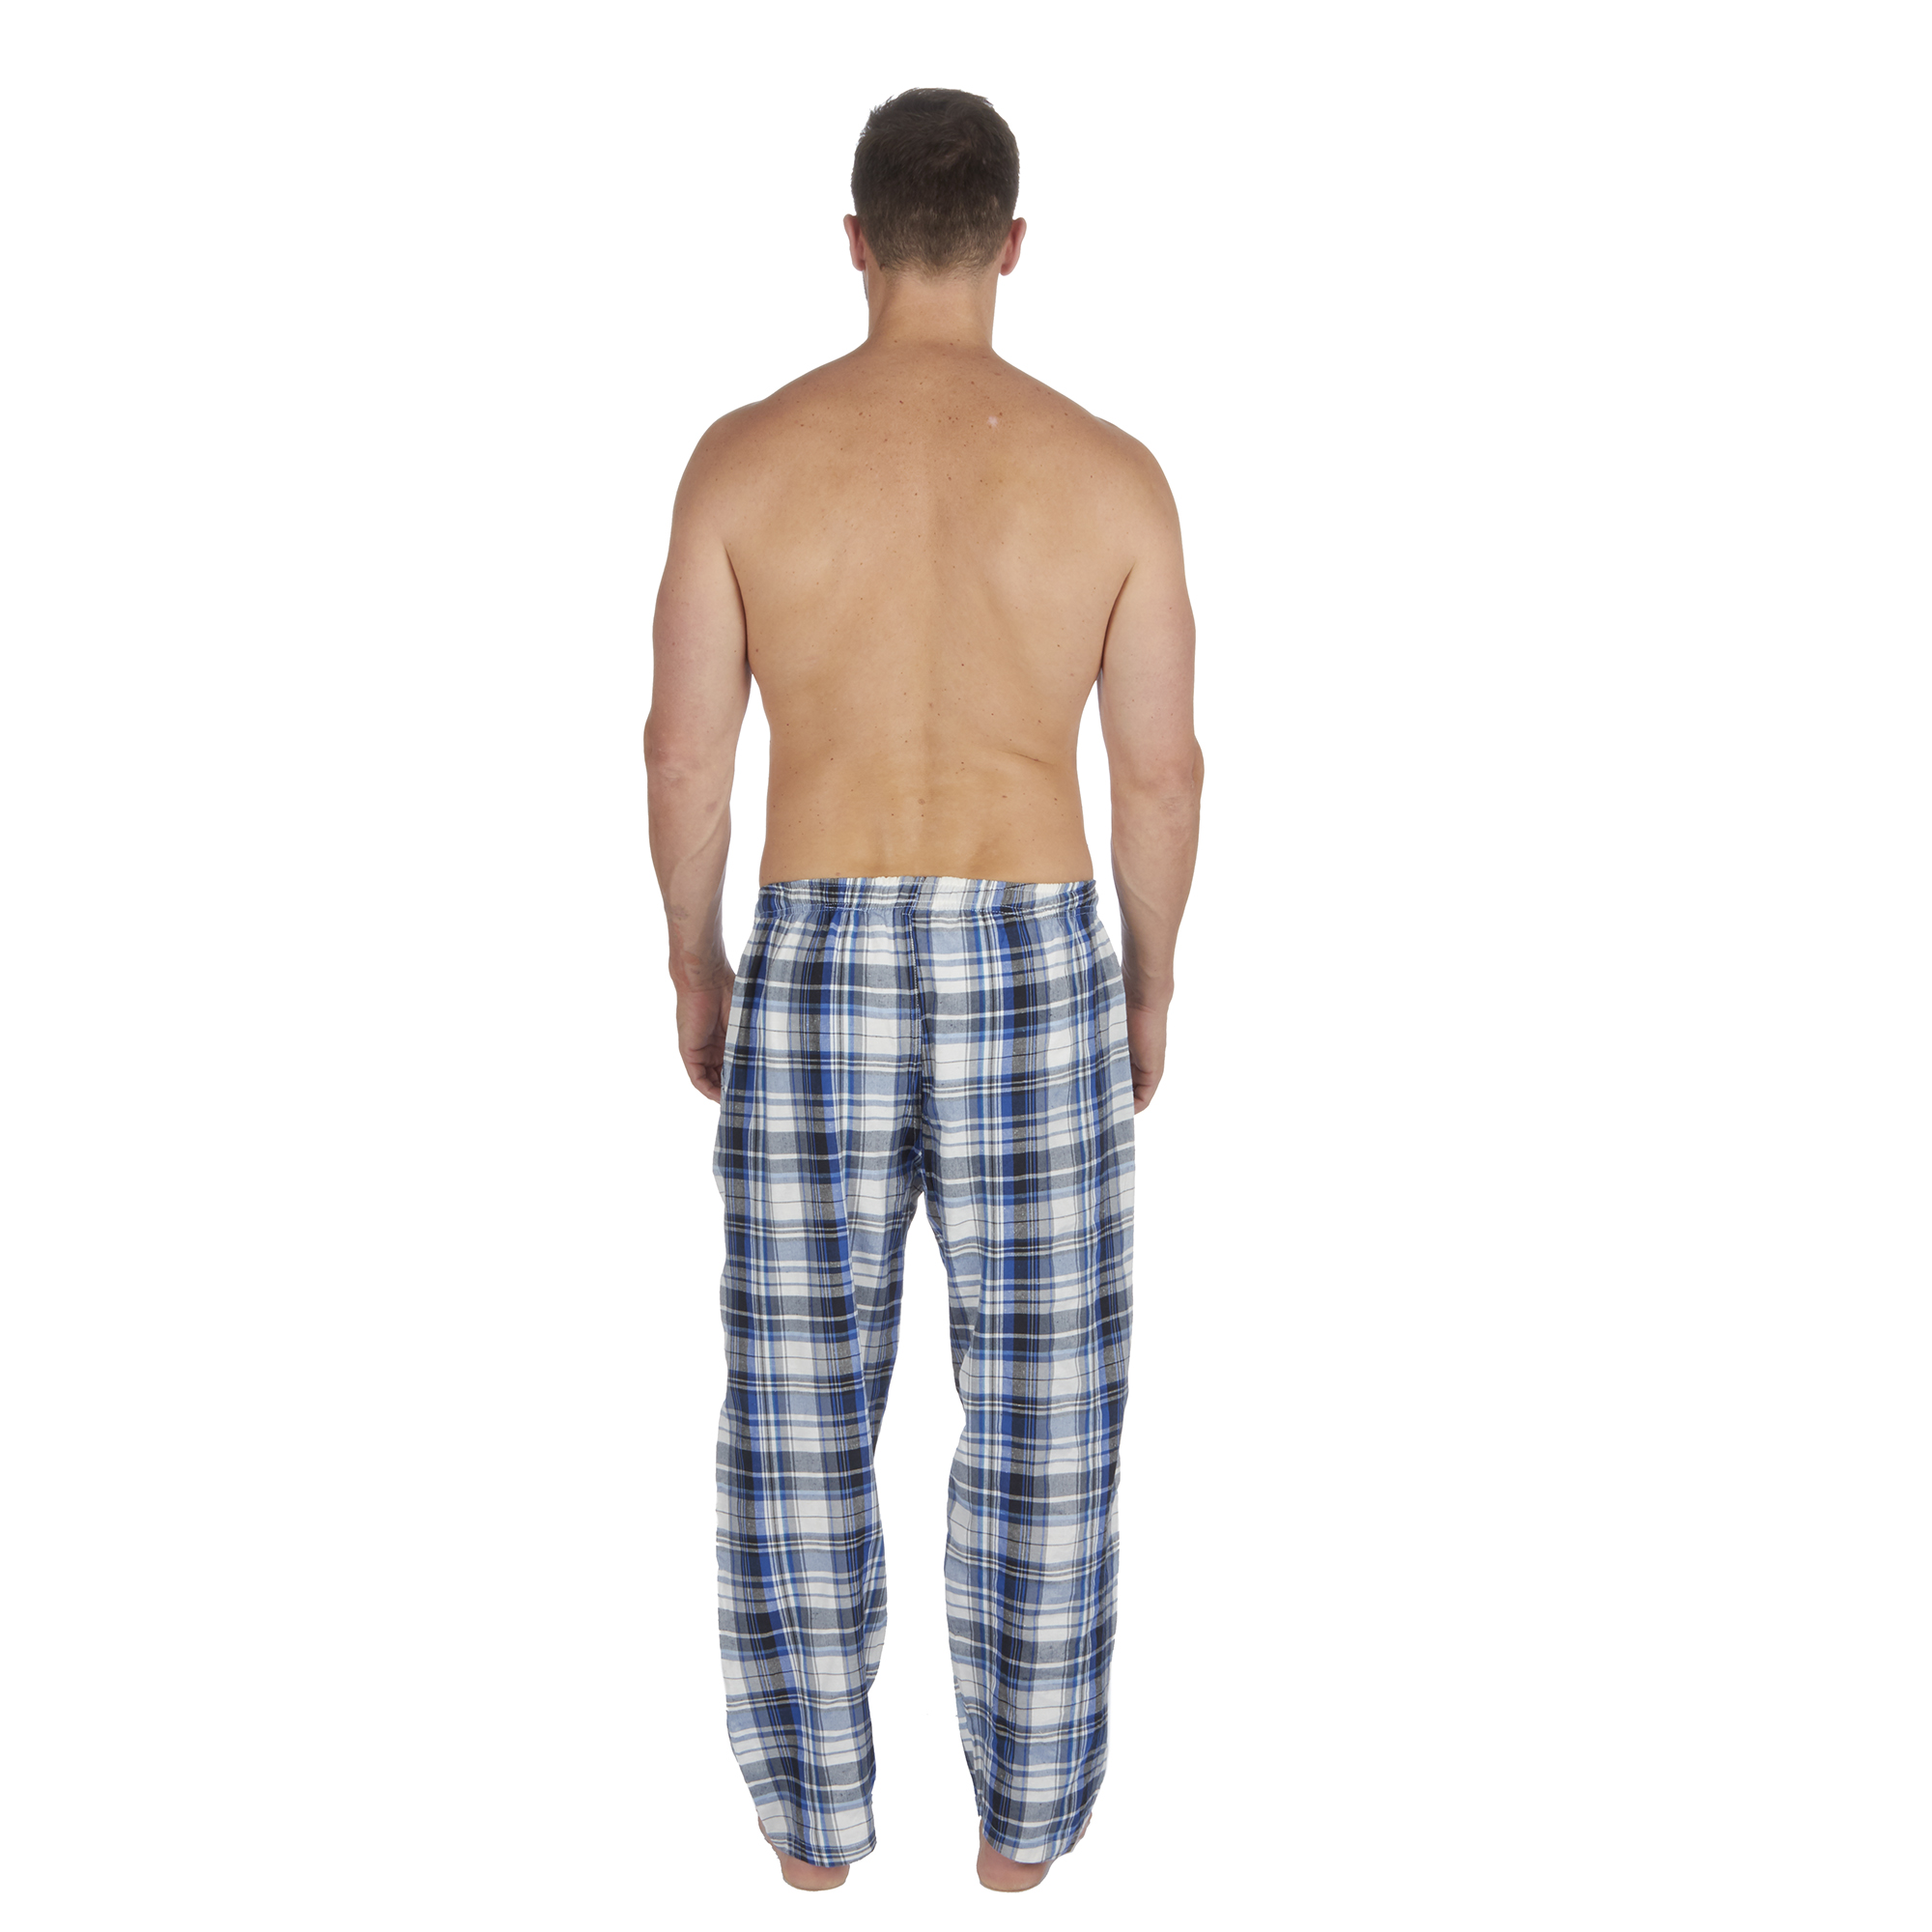 Jason-Jones-Homme-Carreaux-Tisse-Pyjama-Pantalon-en-Coton-Melange-Serge-PJ-Lounge-Pants miniature 19